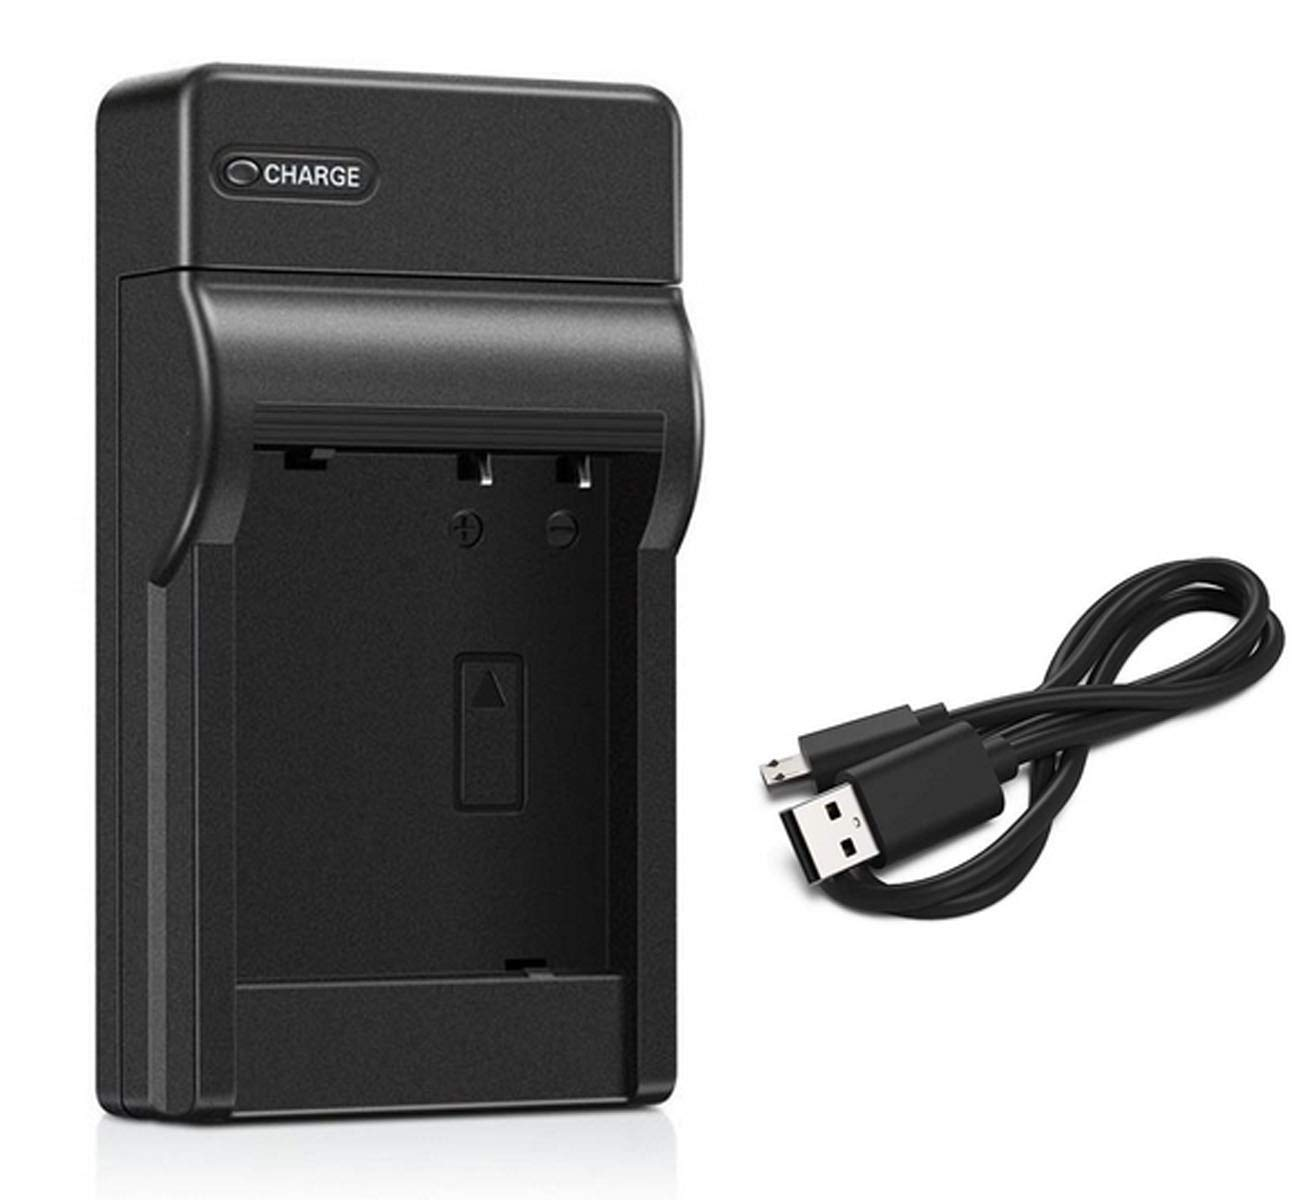 SC-D363 SC-D364 SC-D366 Digital Camcorder SC-D365 Battery Charger for Samsung SC-D362